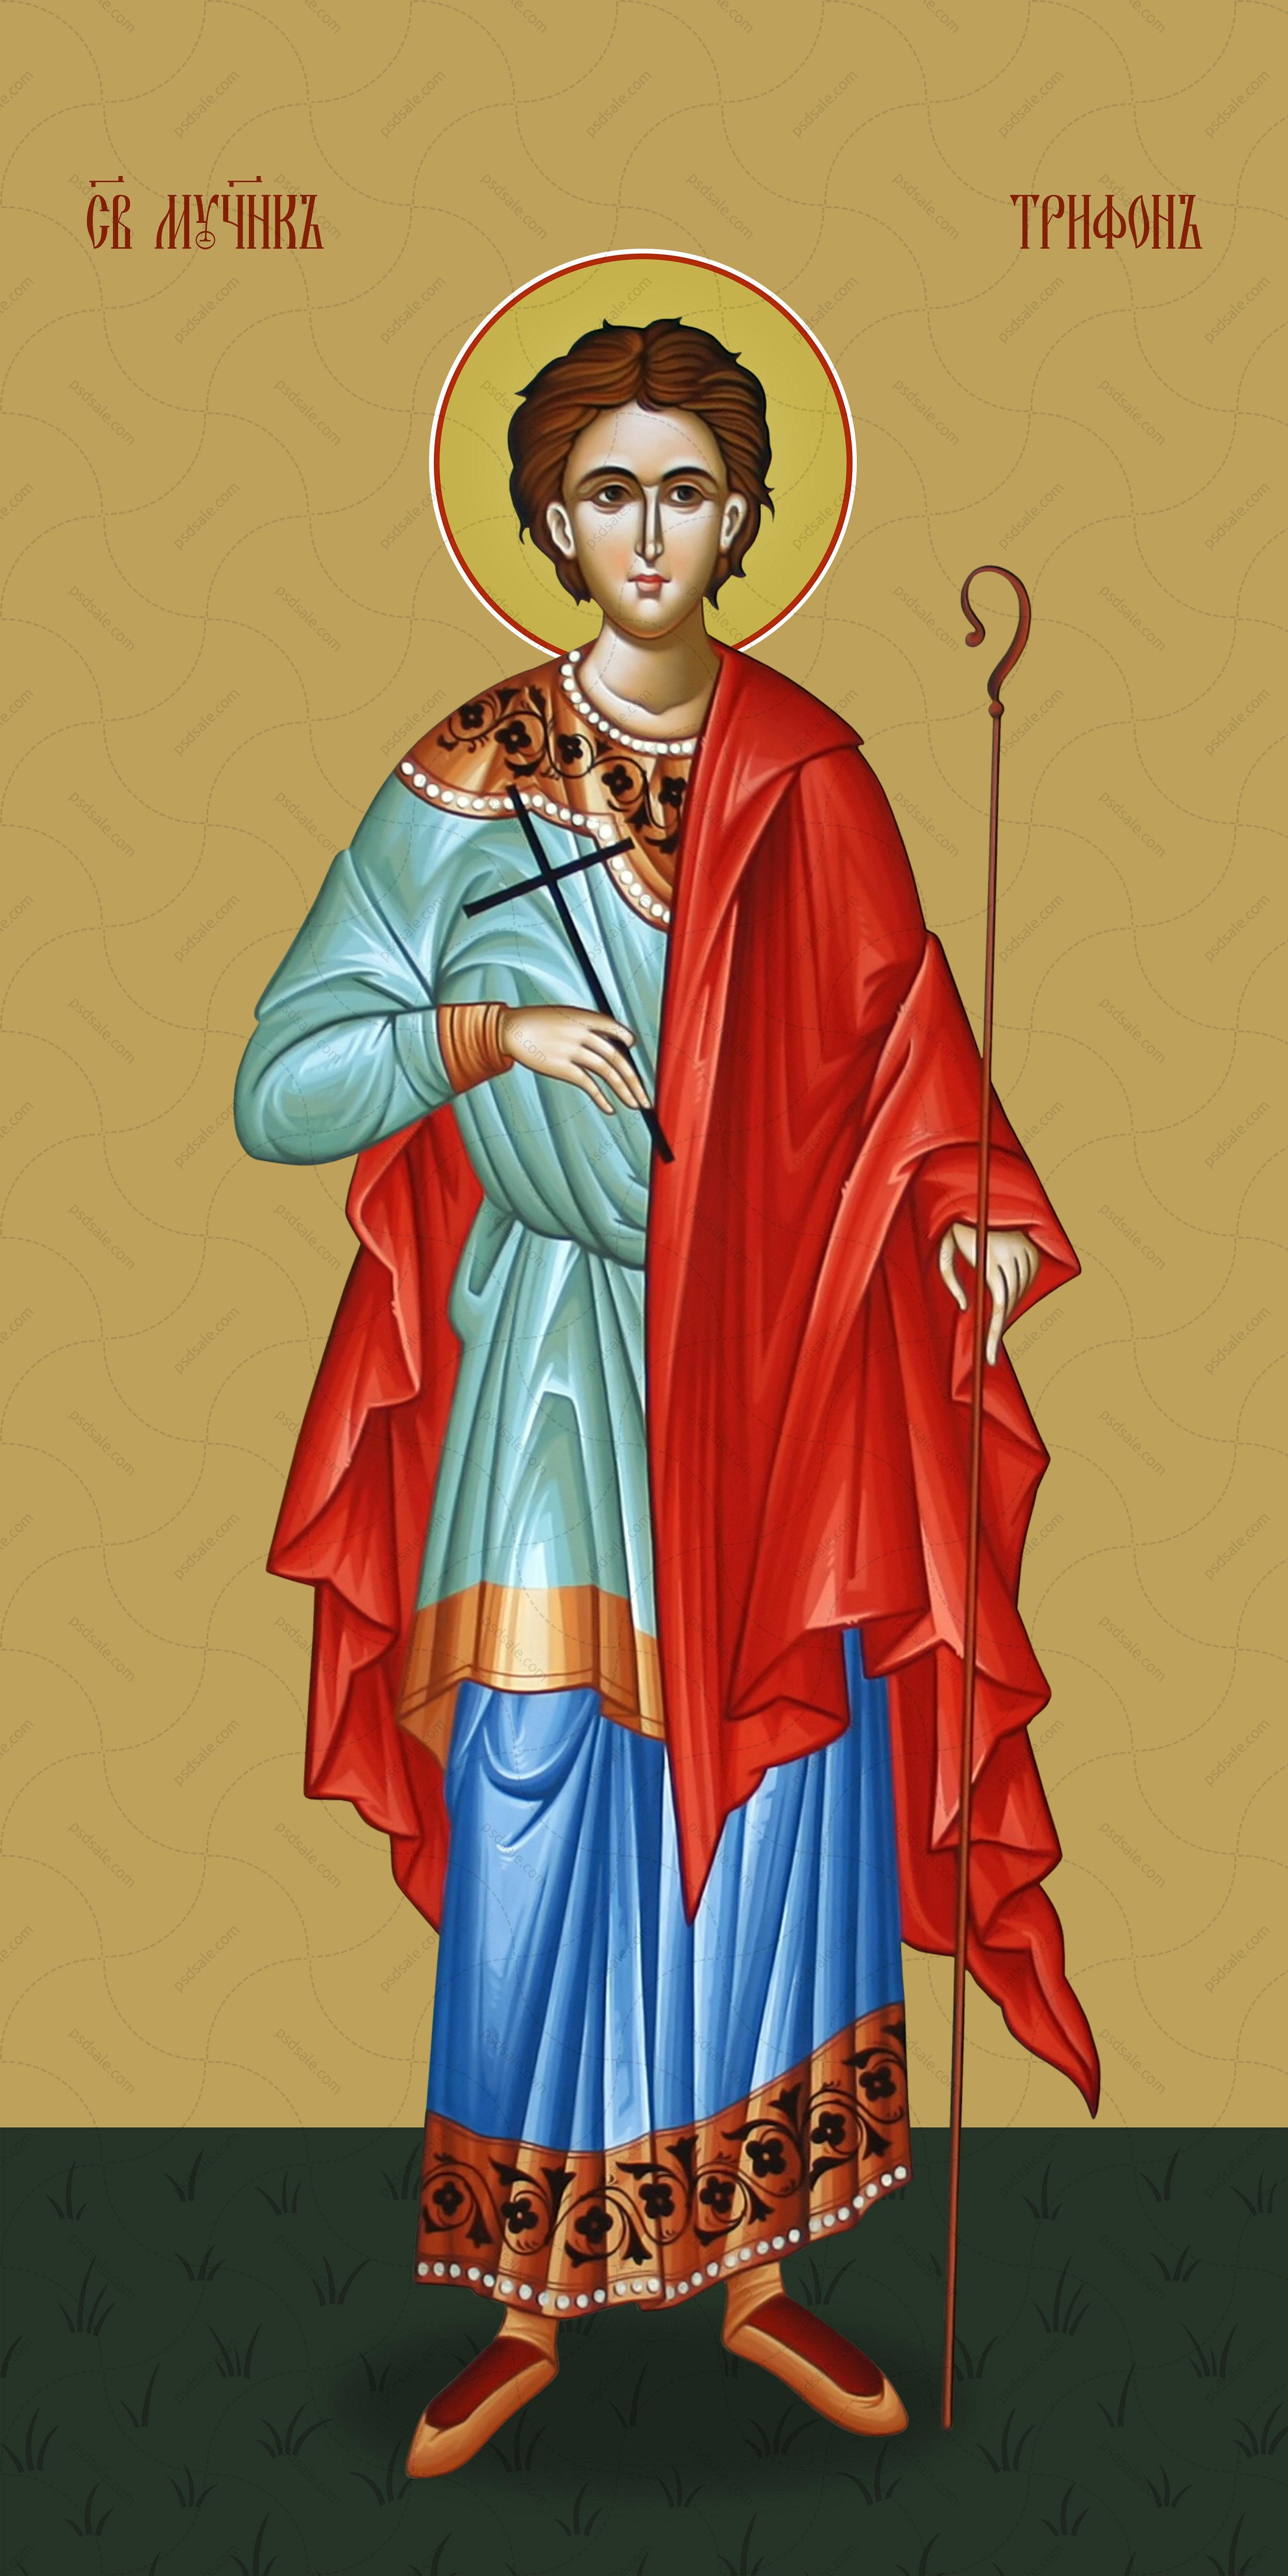 Мерная икона, Трифон Апамейский, мученик